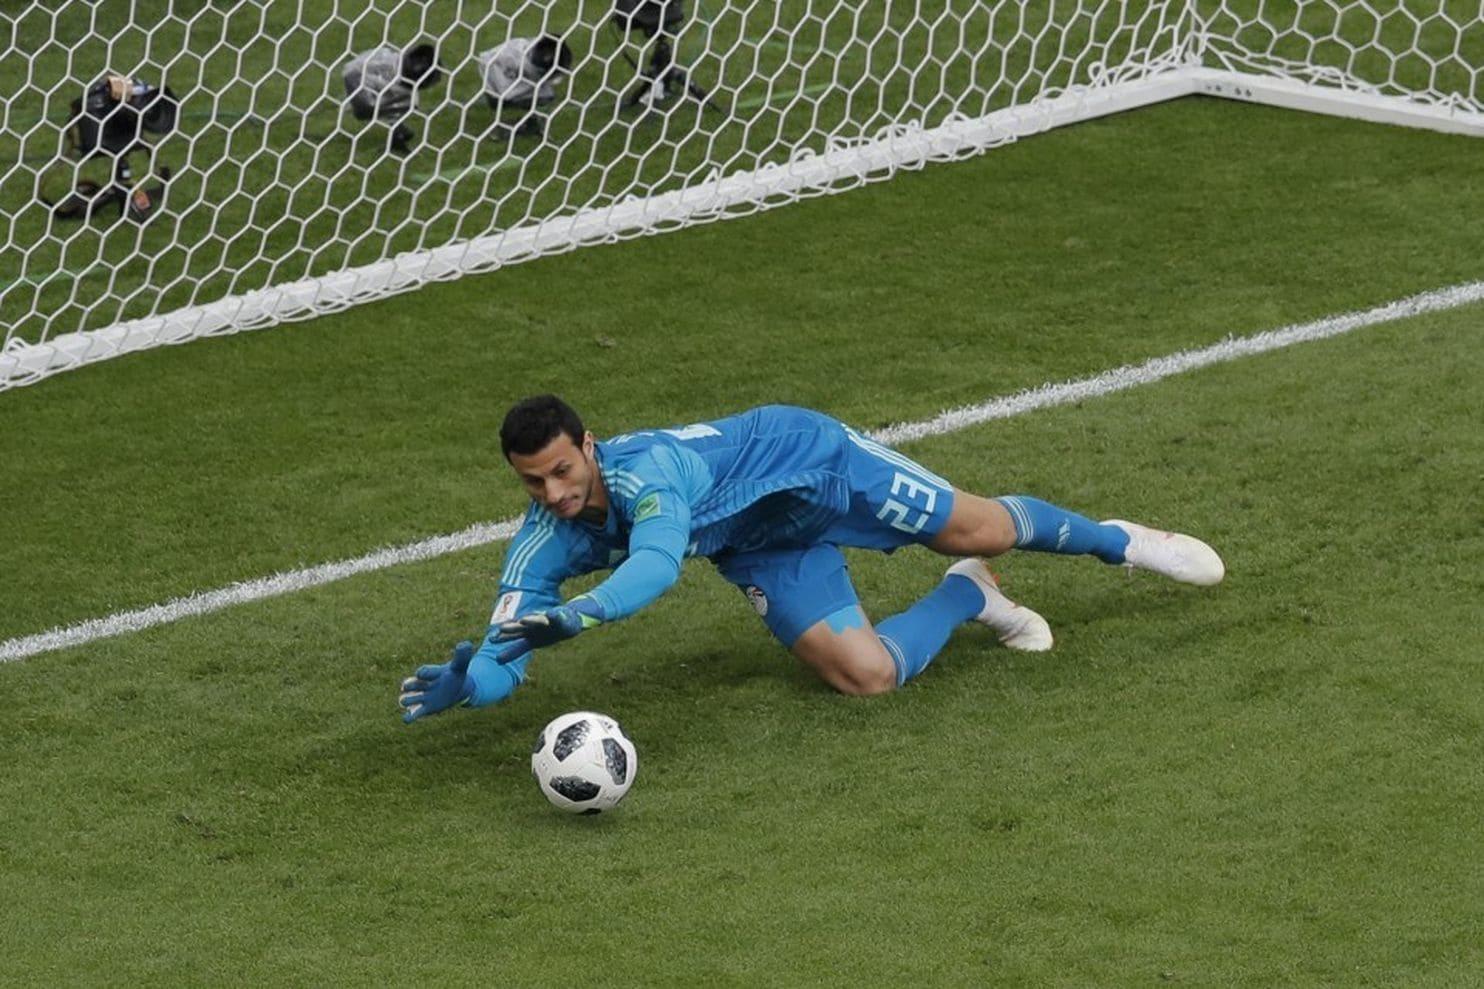 Egypt Goalkeeper Declines Budweiser-Sponsored 'Man of the Match' Trophy at World Cup